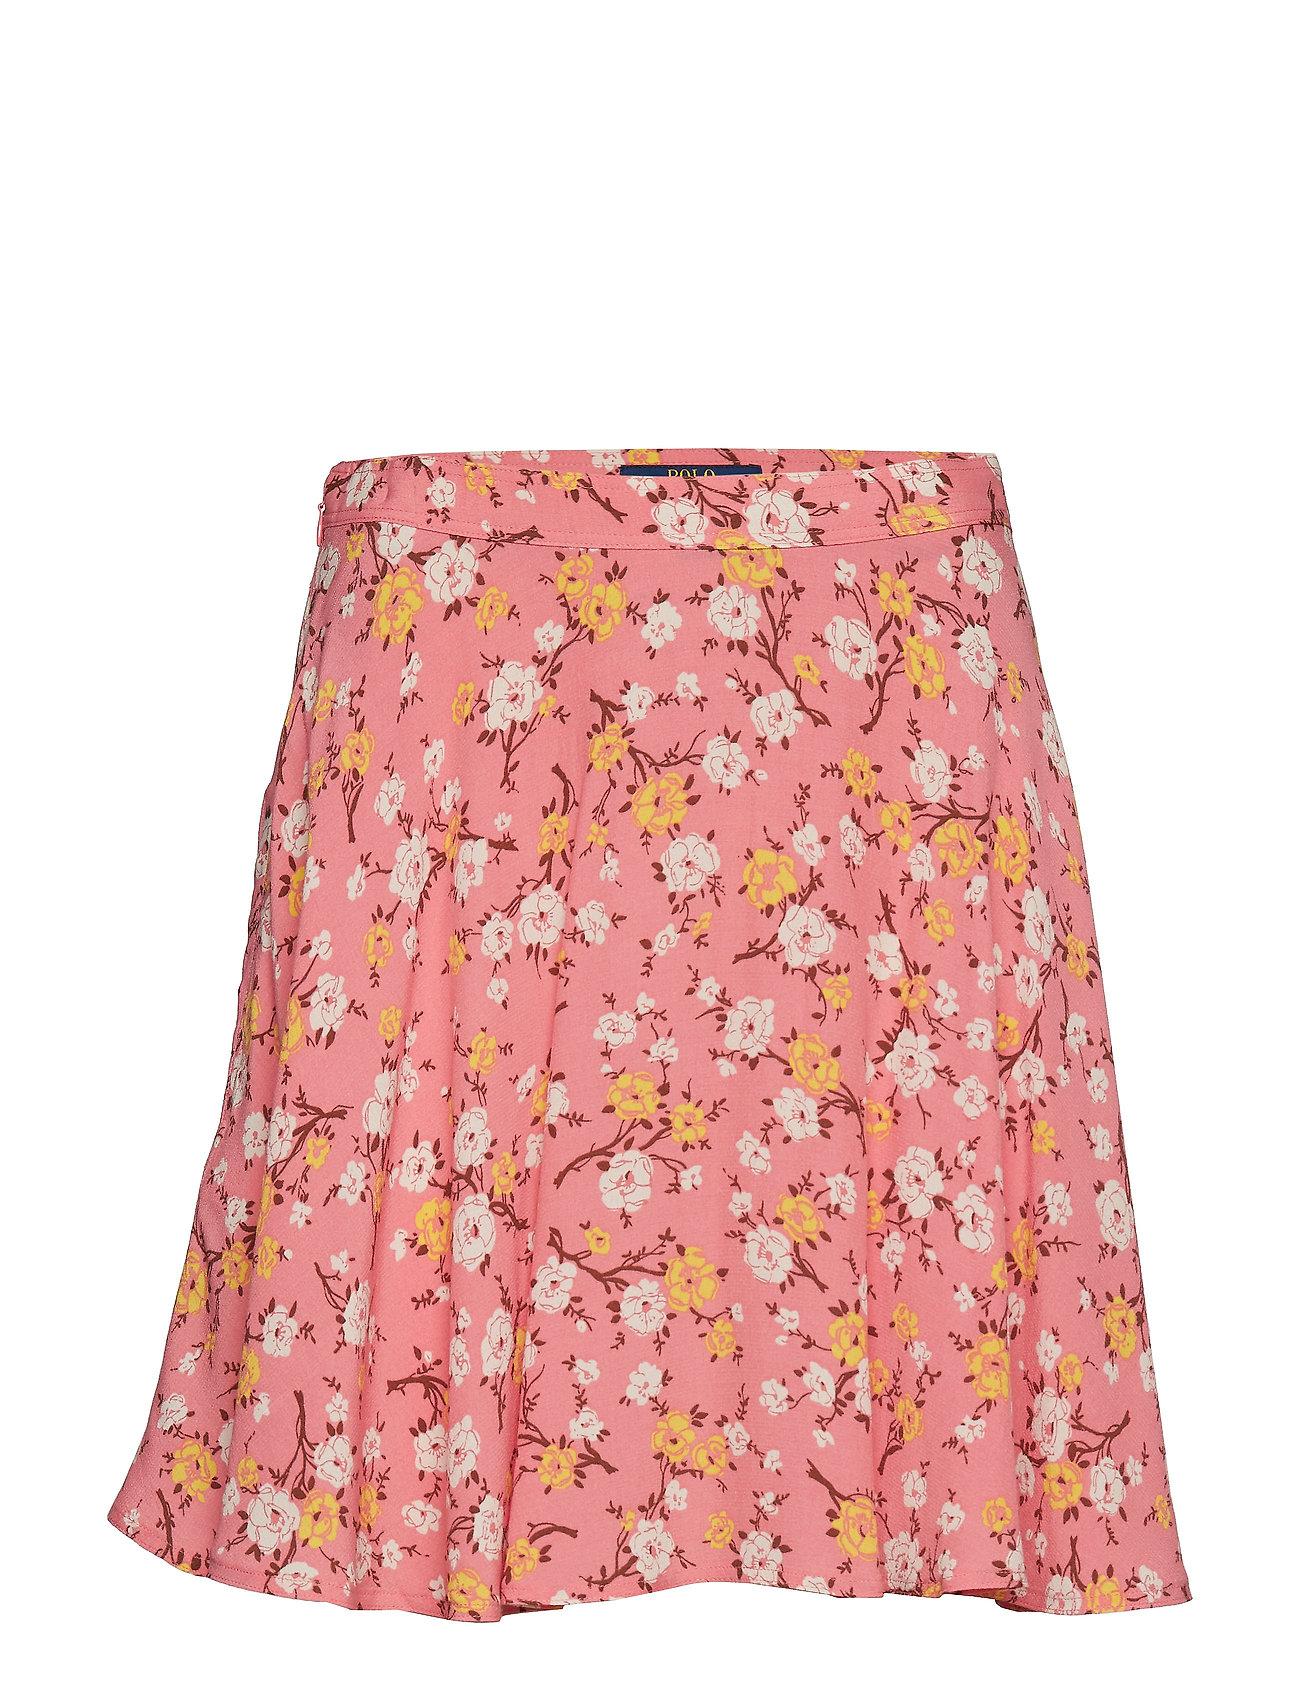 Polo Ralph Lauren Floral Flared Miniskirt - BLUSH FLORAL